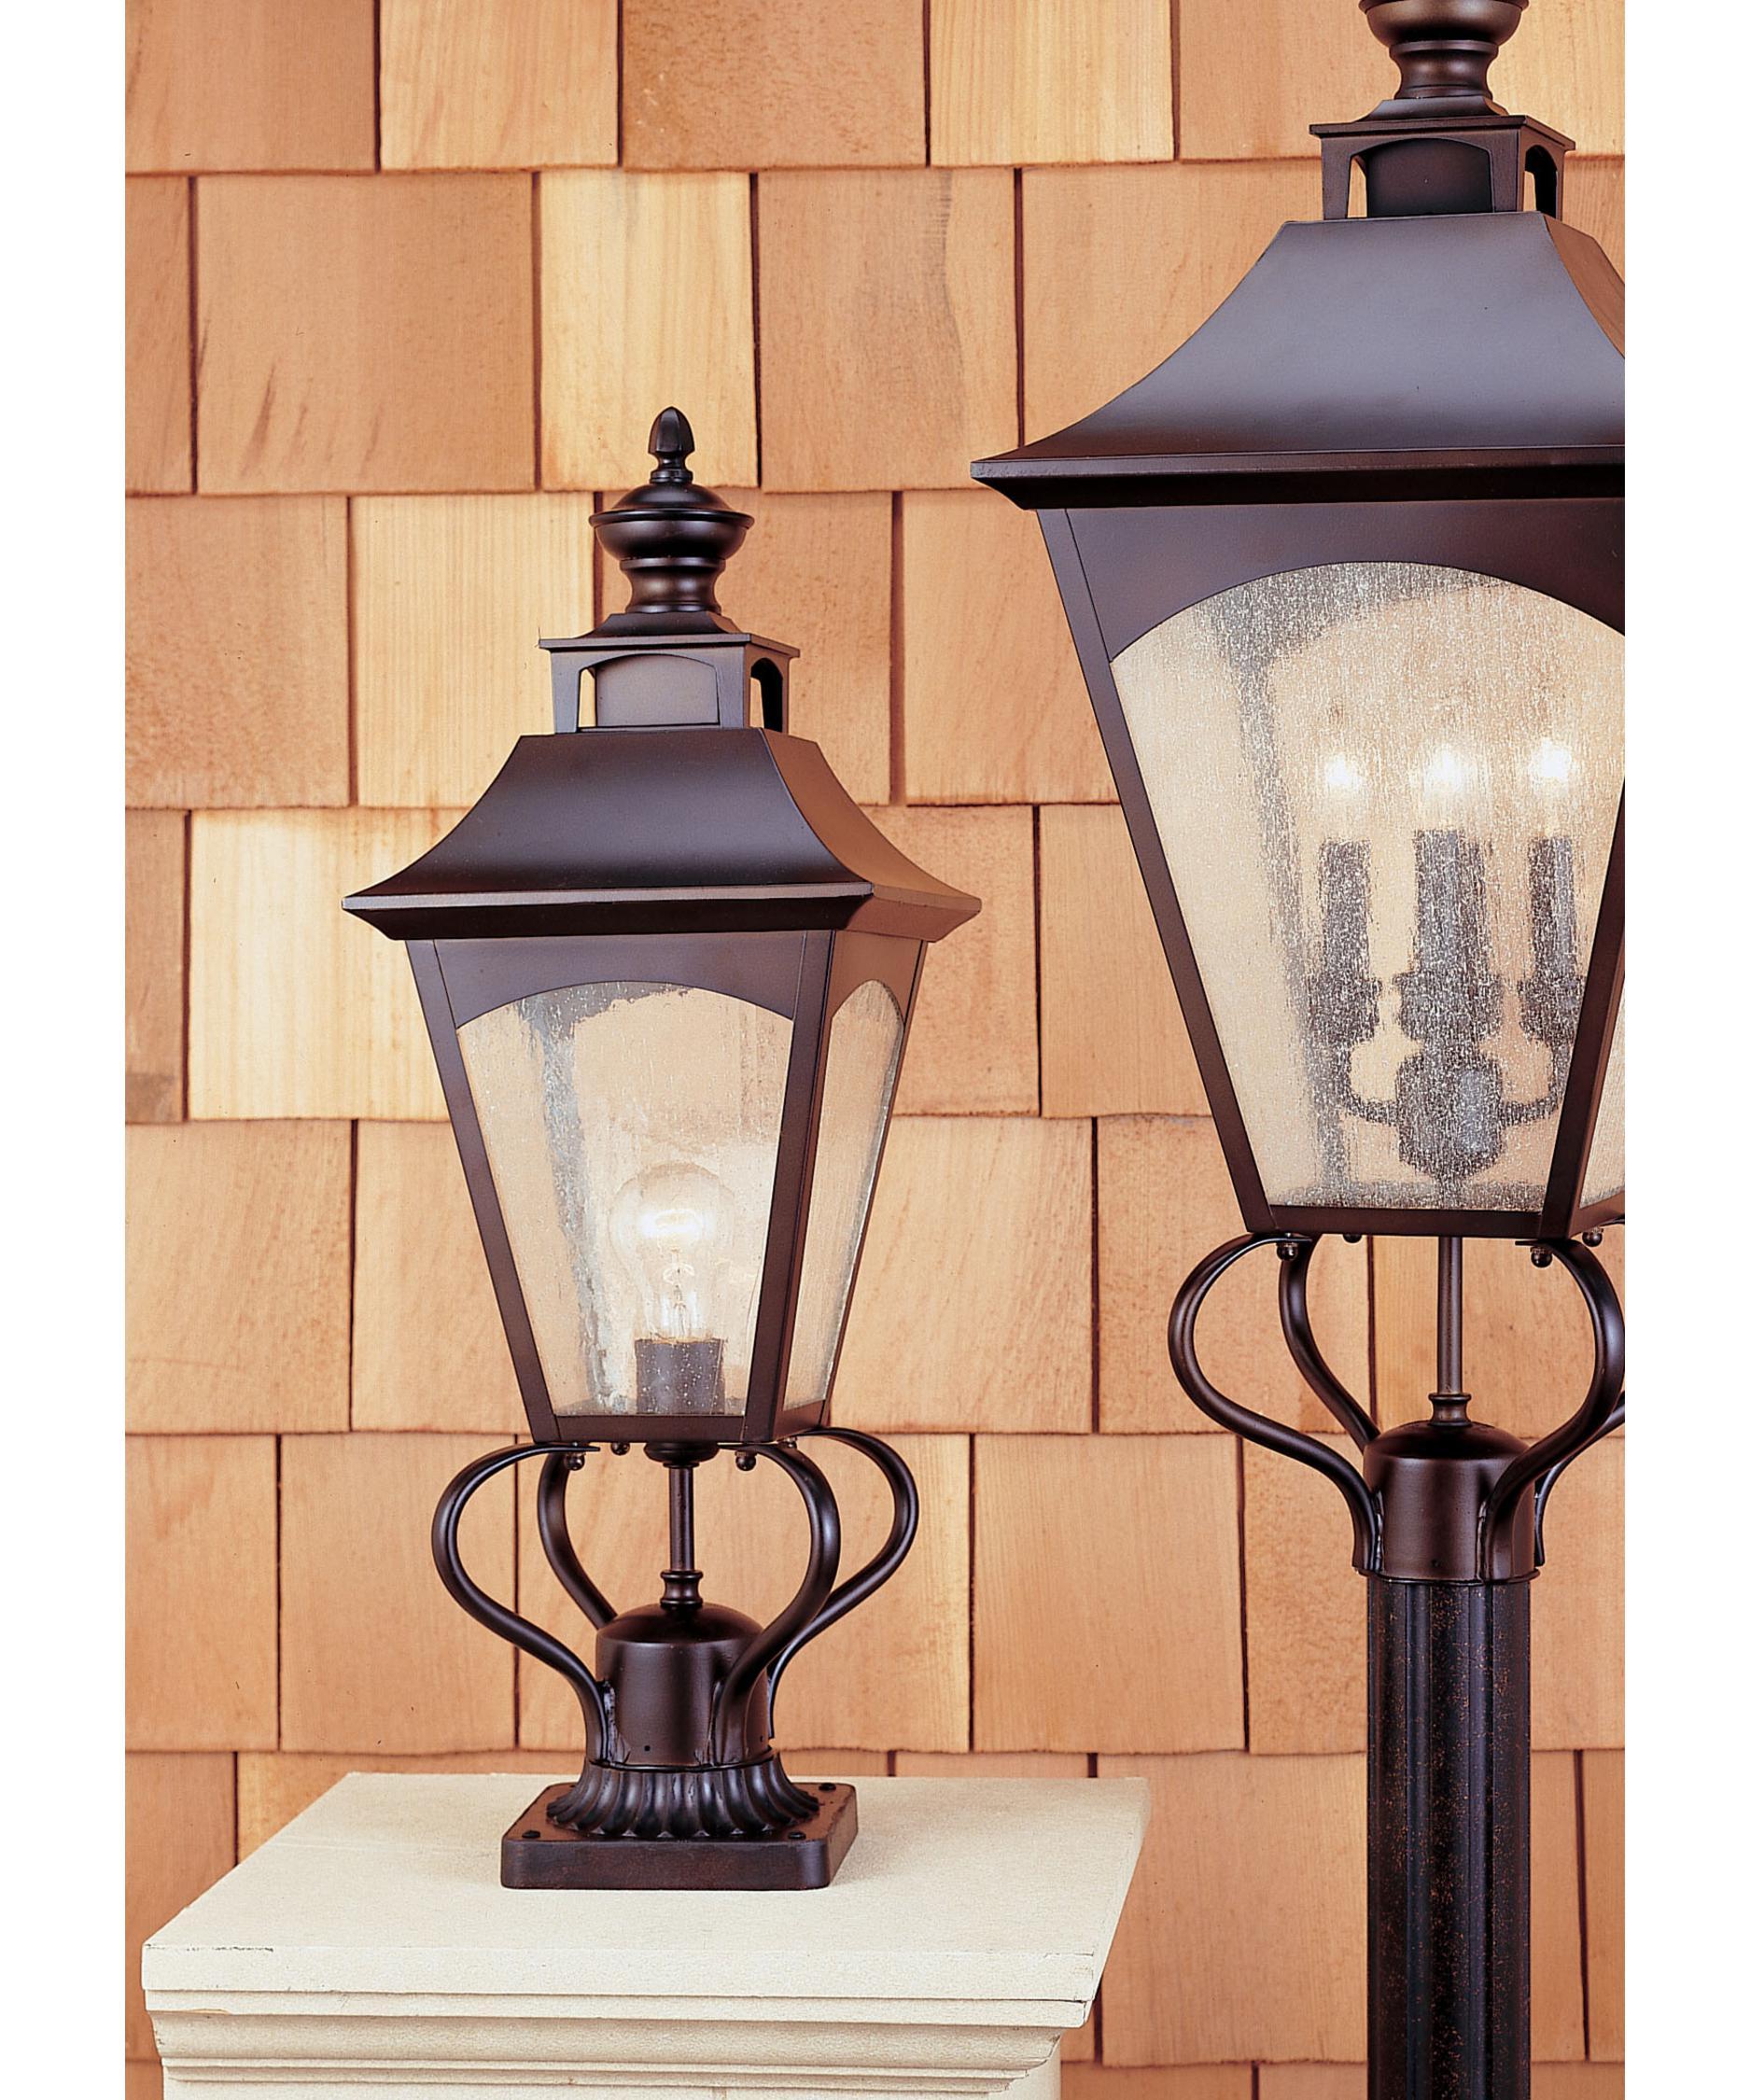 Murray Feiss Outdoor Lighting: Murray Feiss OL1007 Homestead 1 Light Outdoor Post Lamp